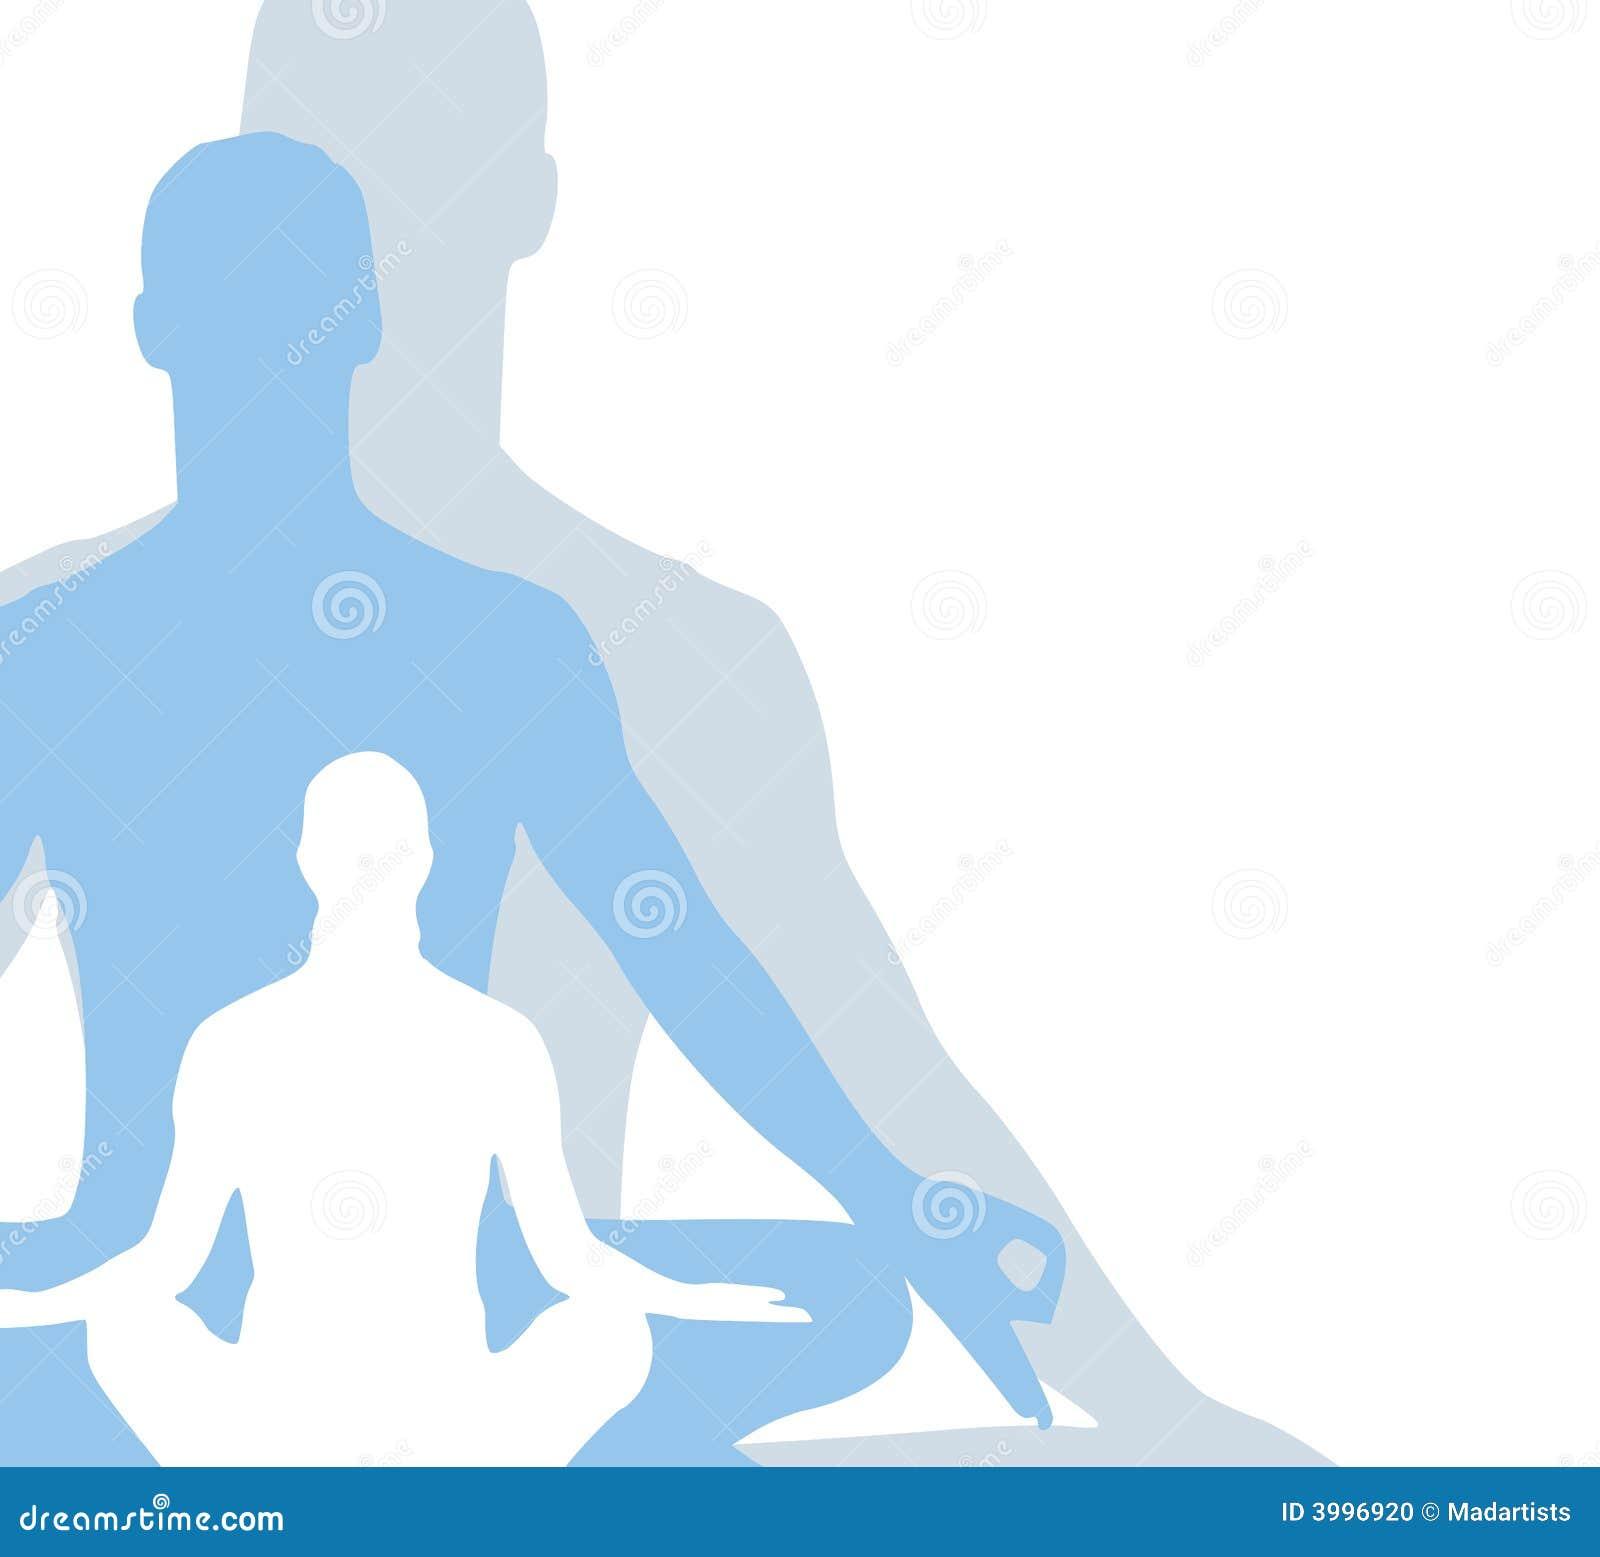 Sitting Position Yoga Figures